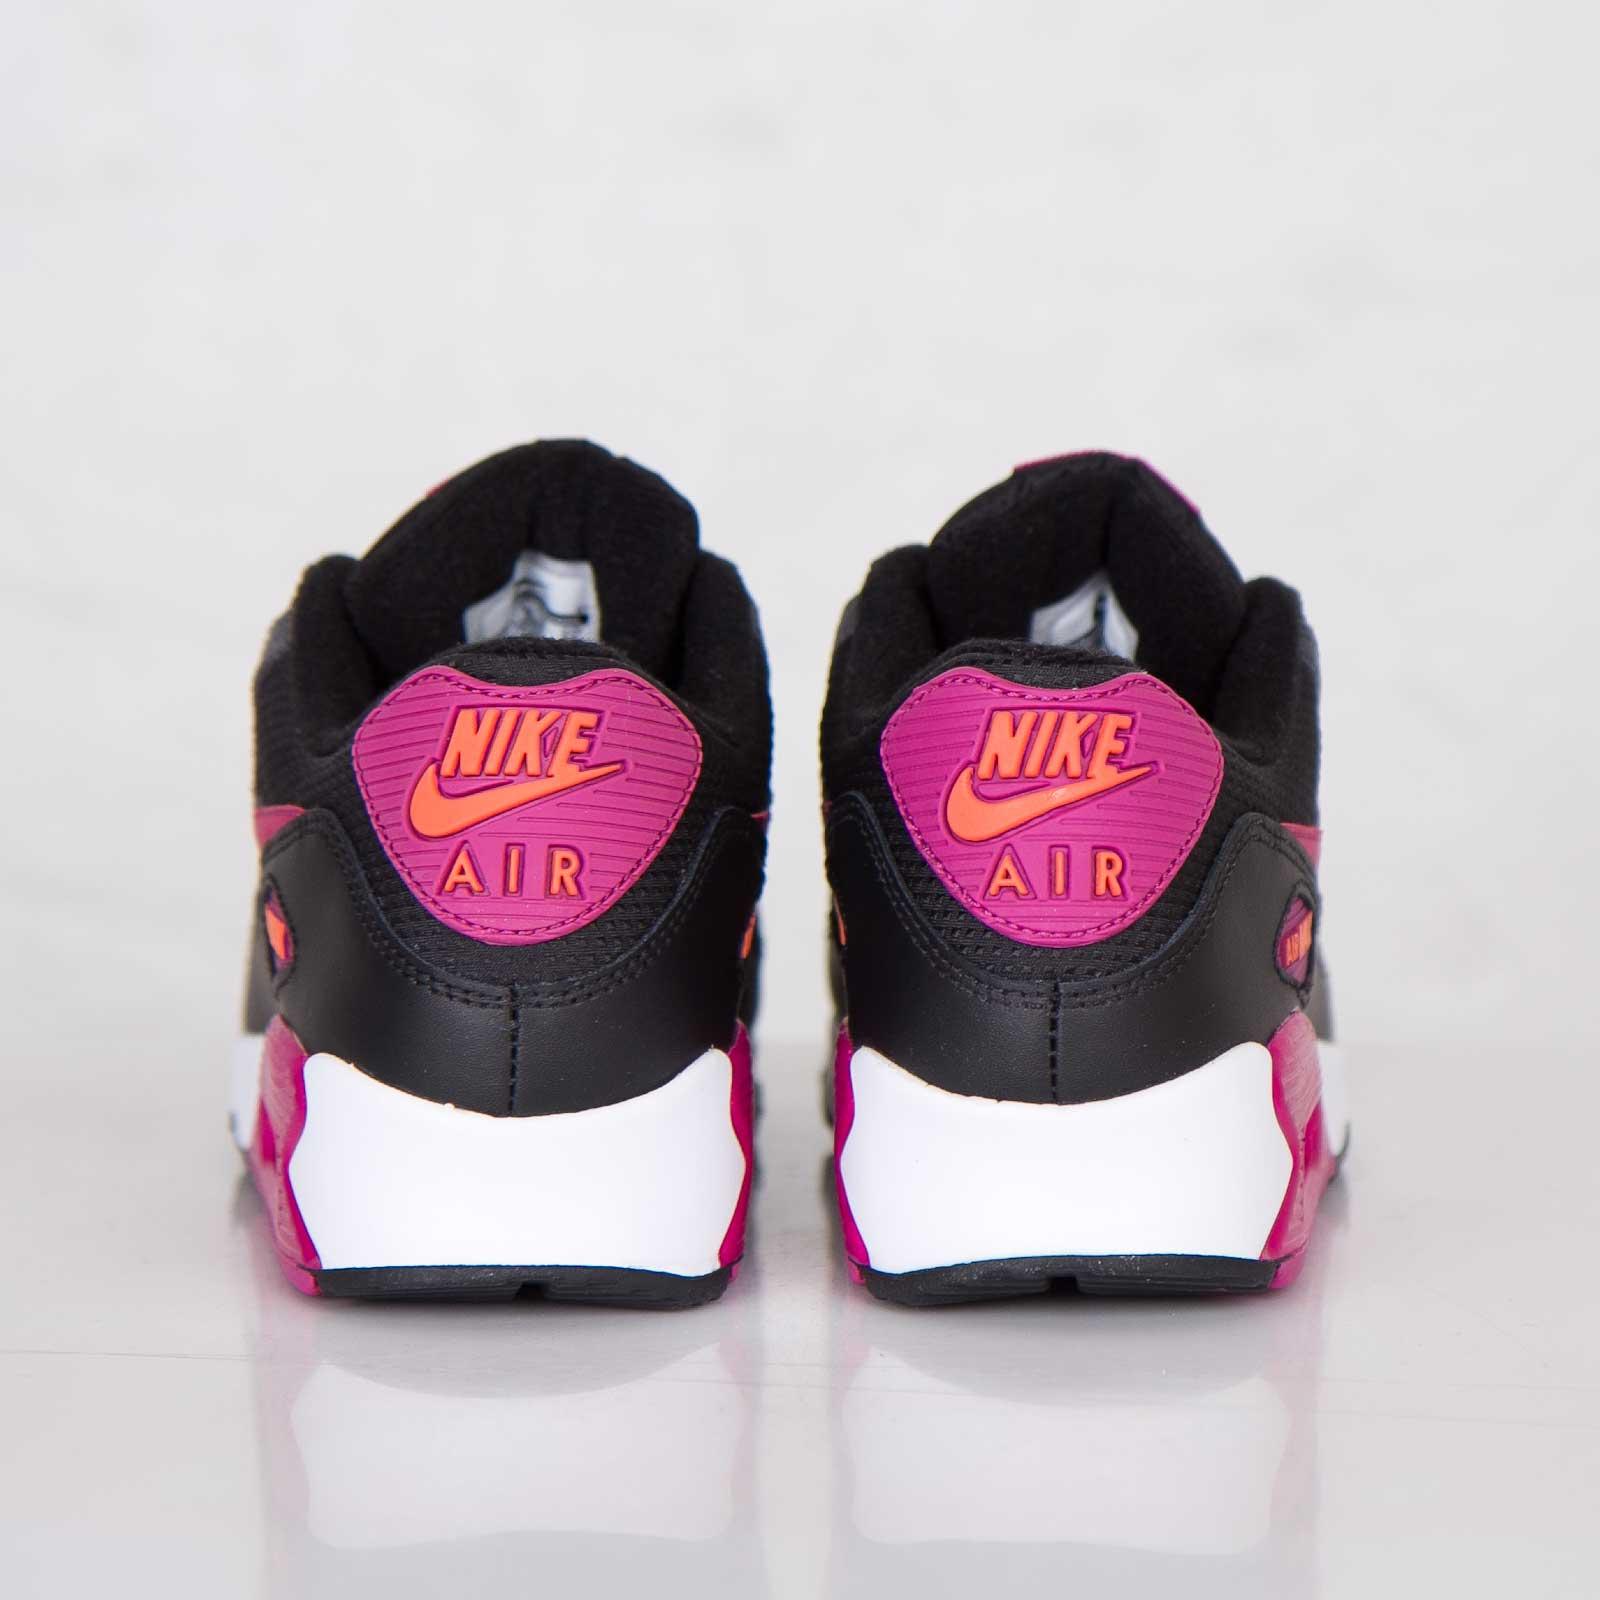 e9cd23cc67 Nike Wmns Air Max 90 Essential - 616730-005 - Sneakersnstuff | sneakers &  streetwear online since 1999